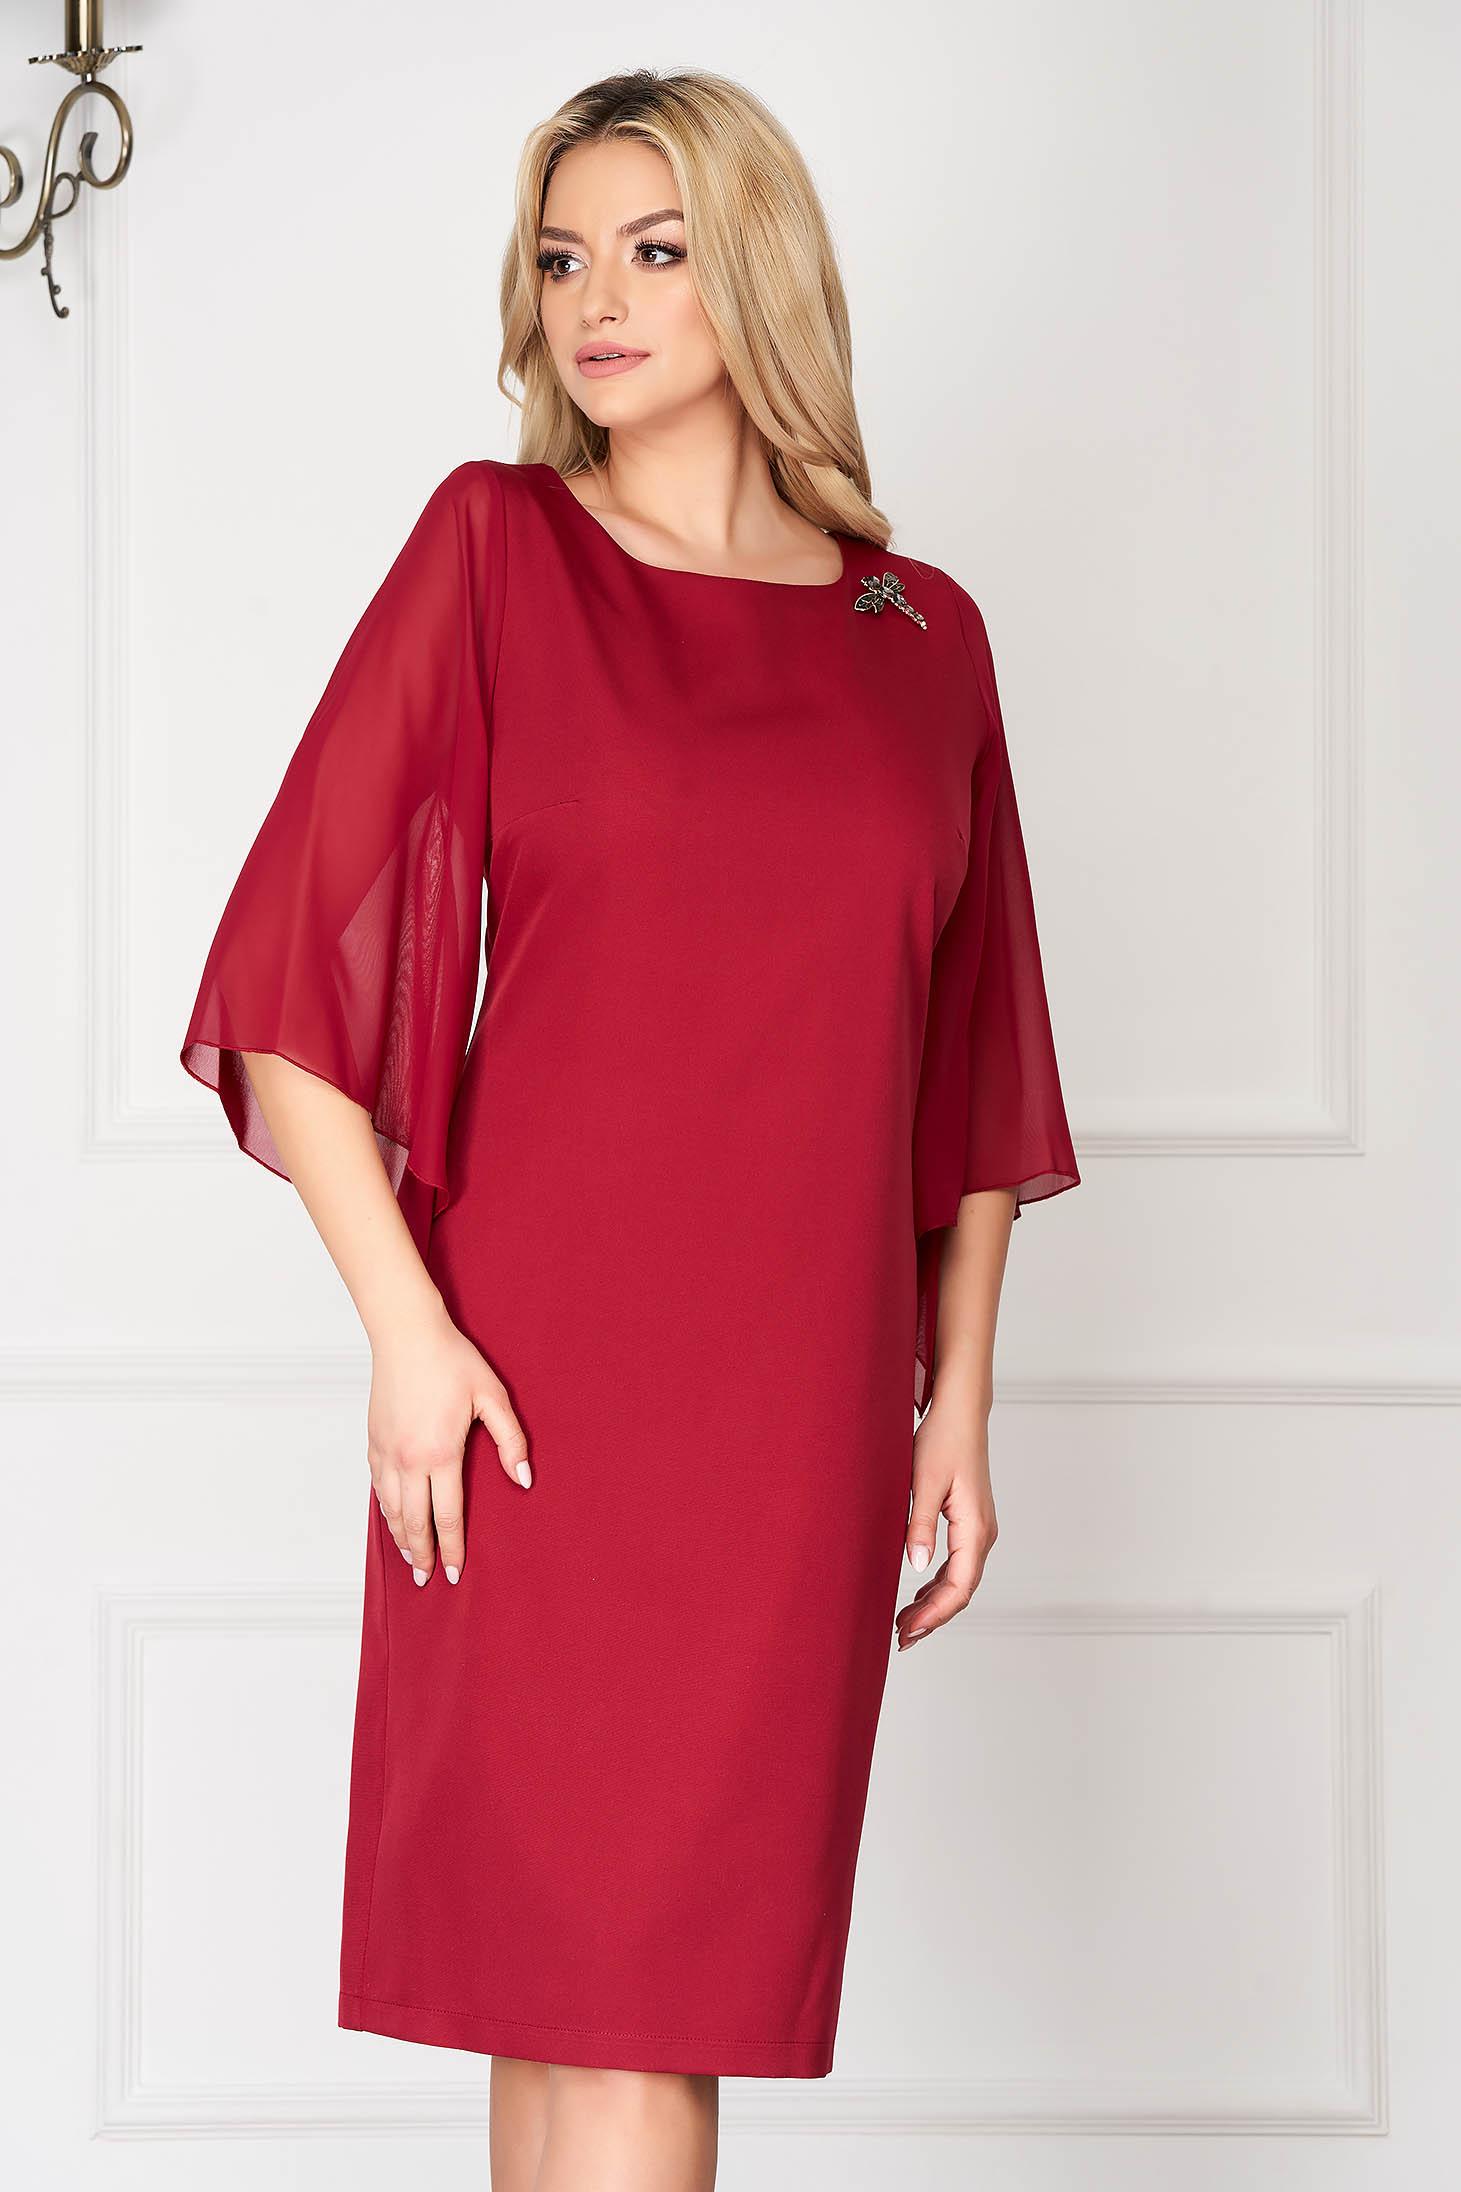 Burgundy elegant midi dress straight cut with veil sleeves cloth fabric